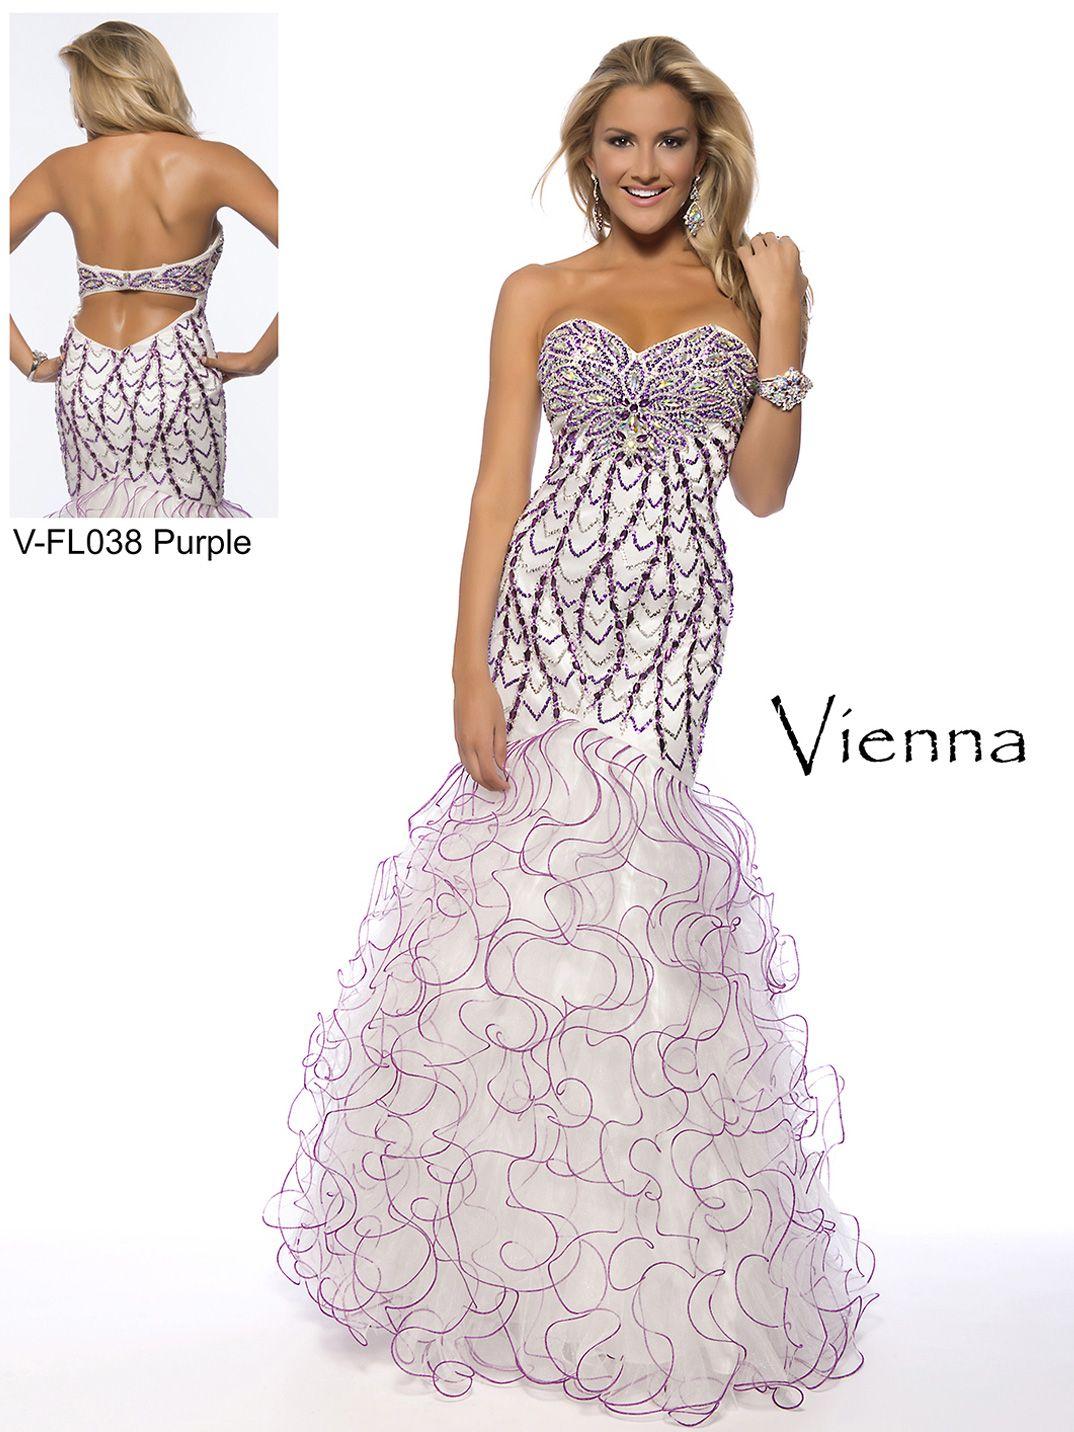 Sweetheart Beaded Top Formal Prom Dress Vienna Fl038 Prom Dresses Discount Prom Dresses Sweetheart Prom Dress [ 1432 x 1074 Pixel ]